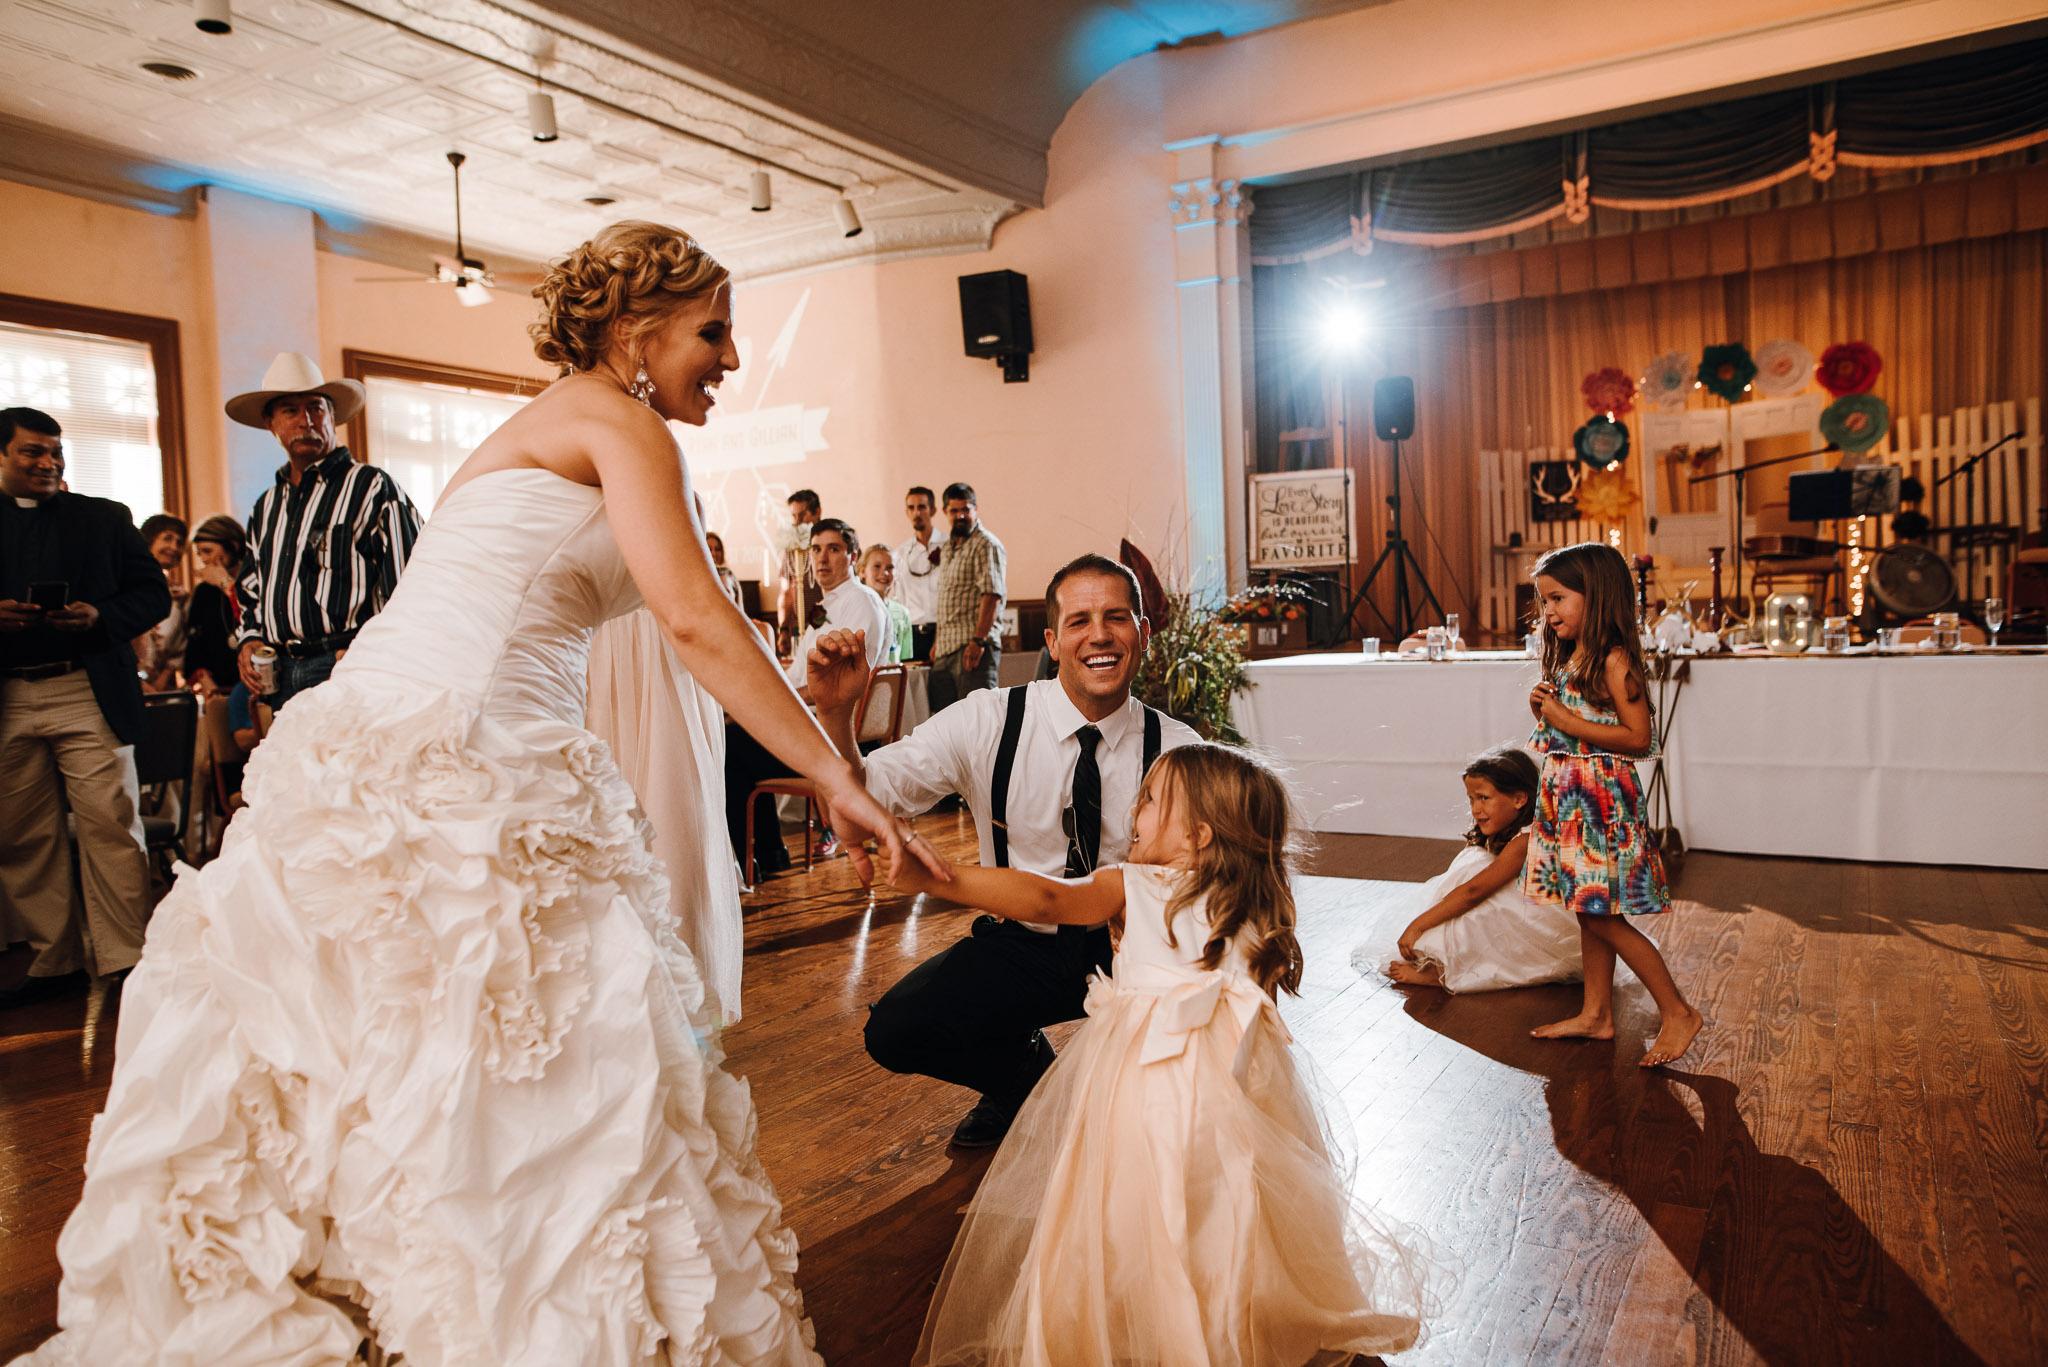 Rowena-West-Texas-Wedding-Photographer-Gillian&Ryan-0039.jpg